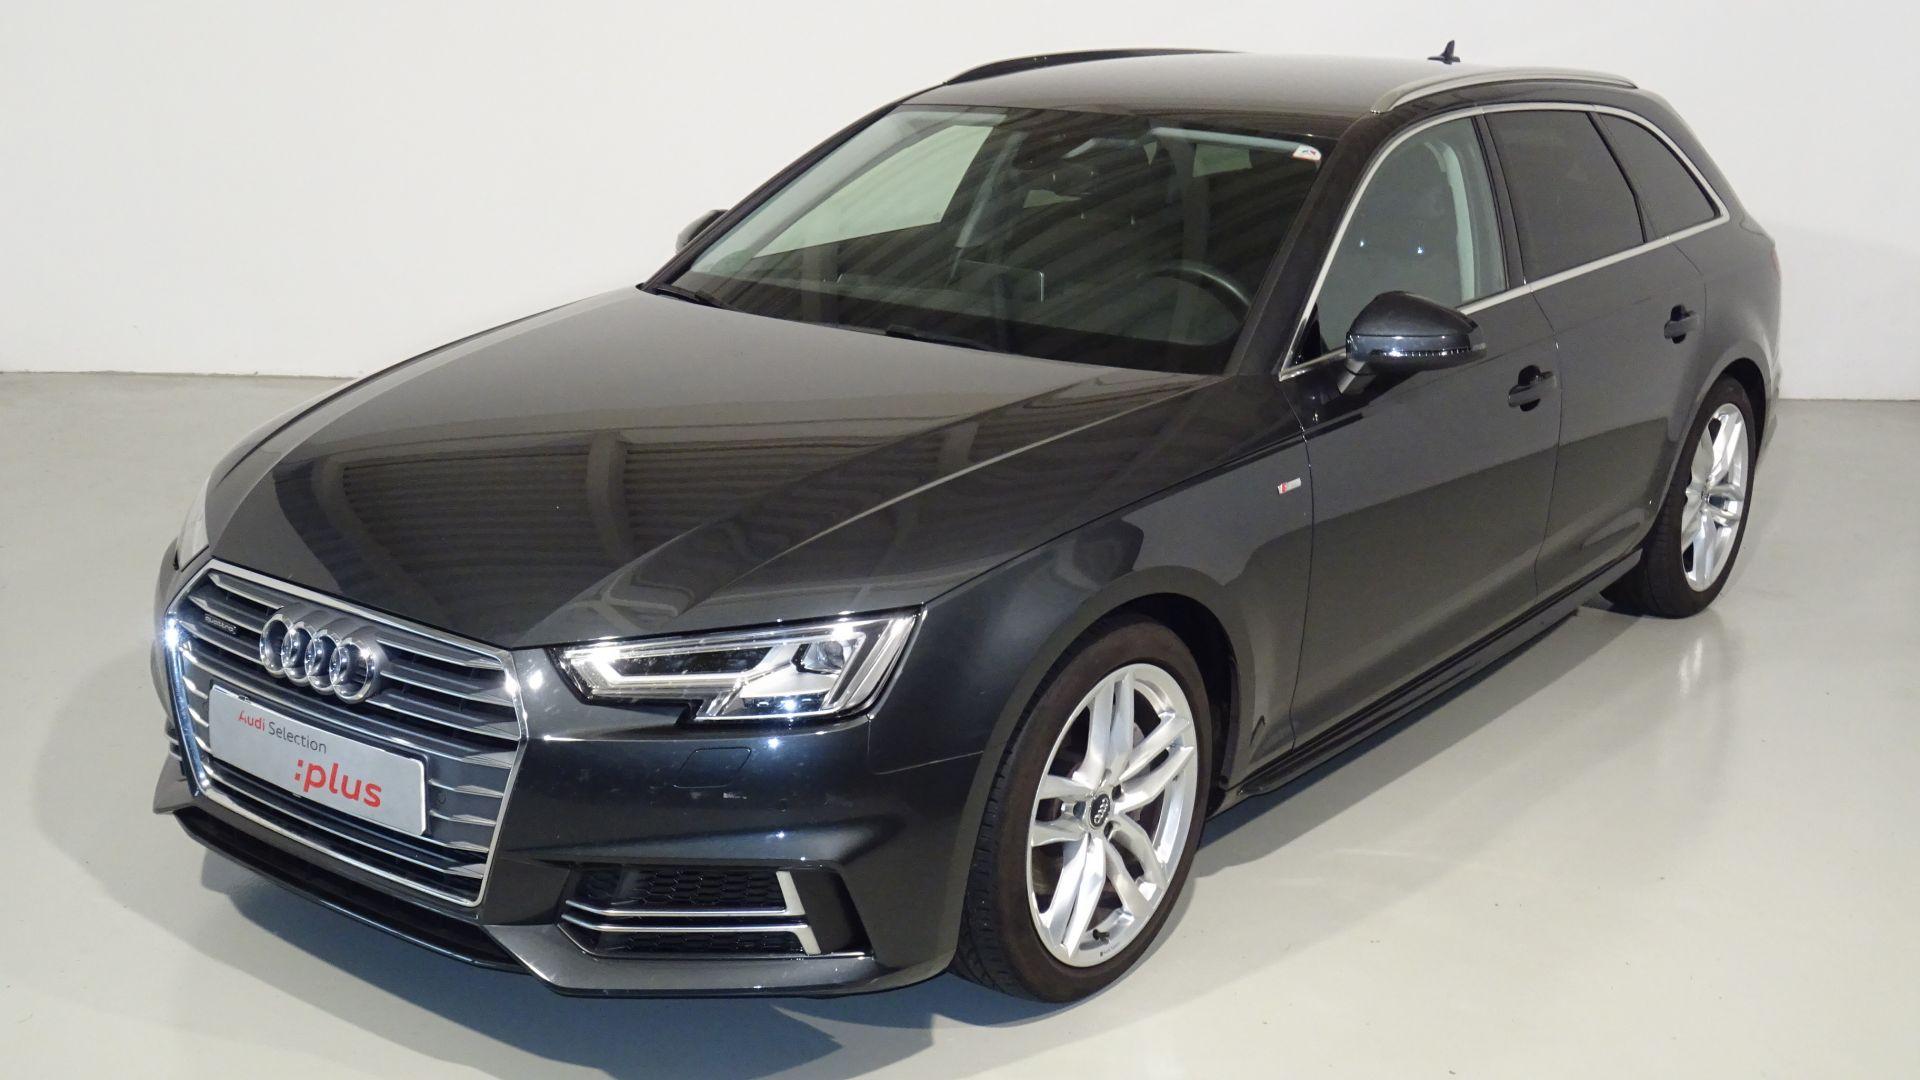 Audi A4 Avant 2.0 TDI quattro S tronic S line ed